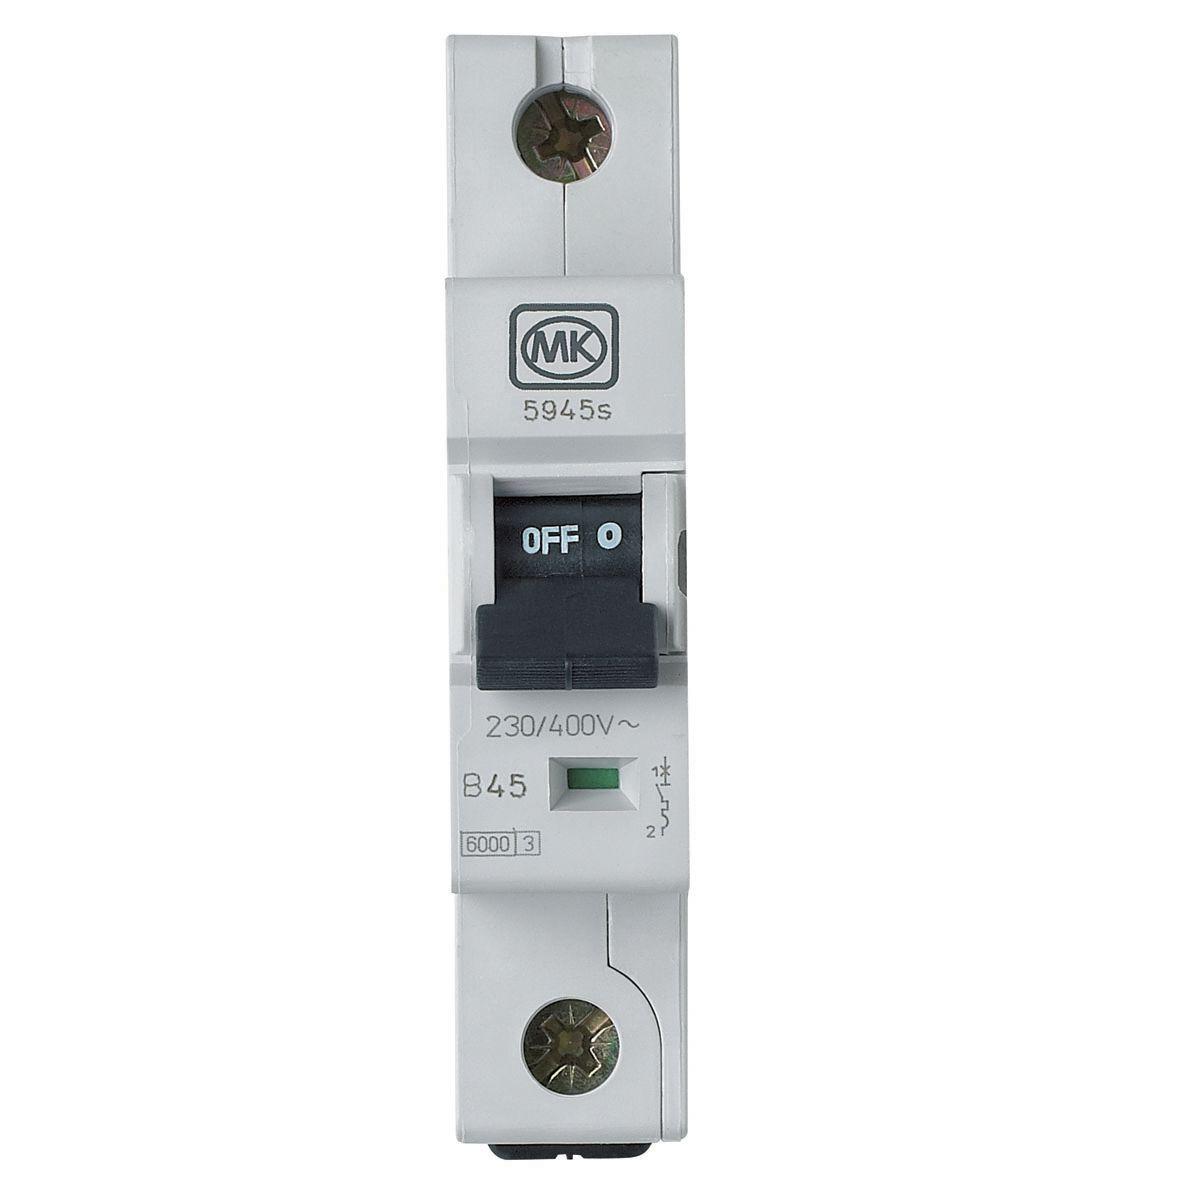 hight resolution of wylex fuse box plug in mcb